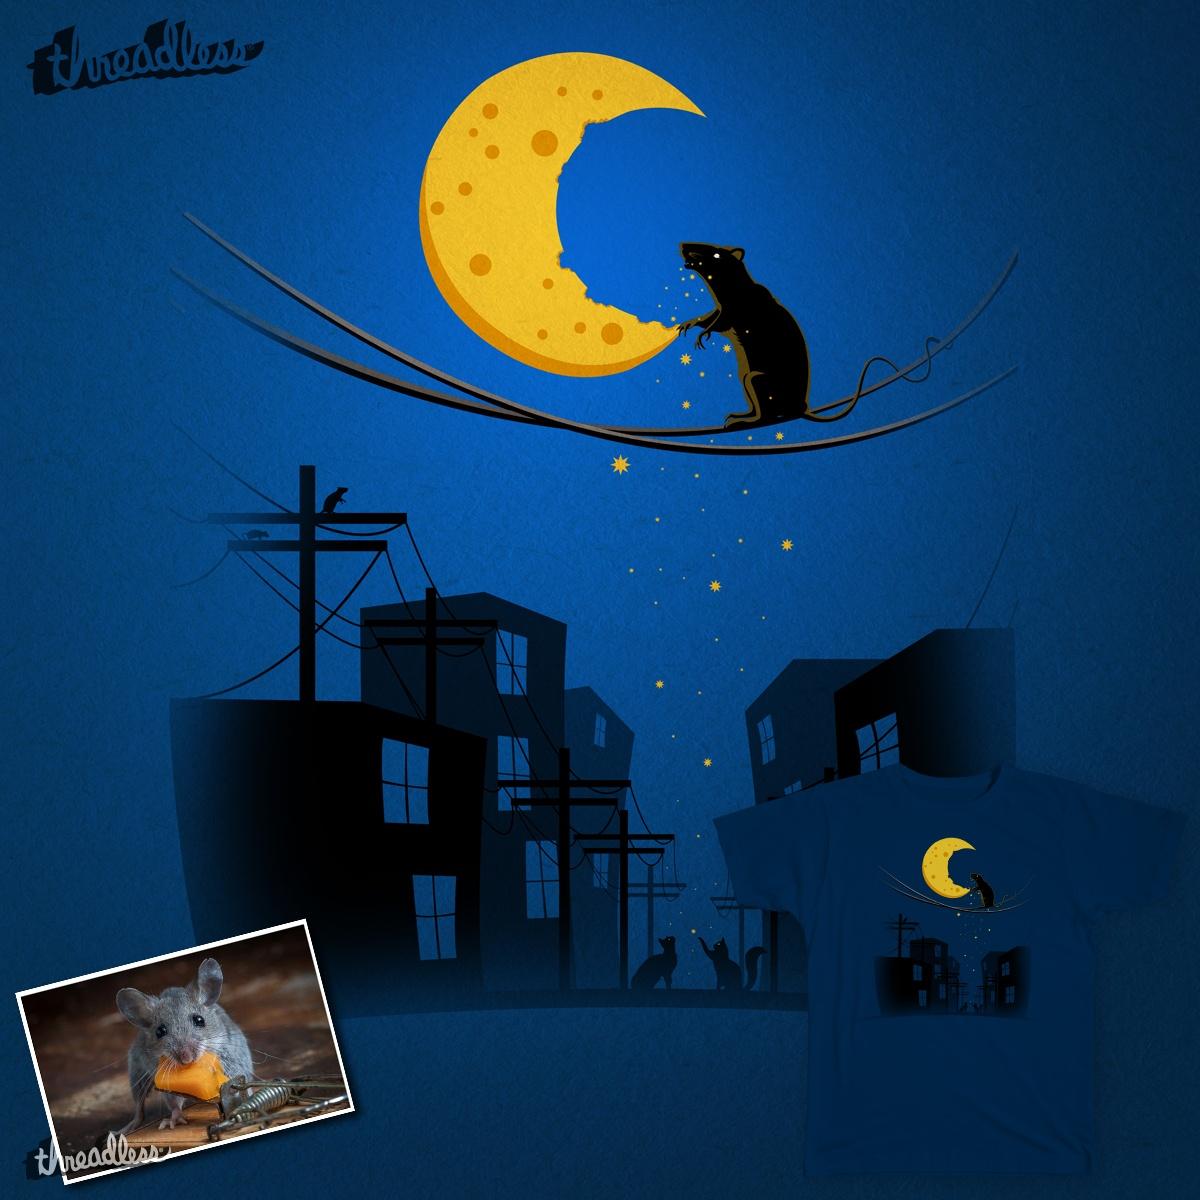 Midnight Snack by dEMOnyo on Threadless